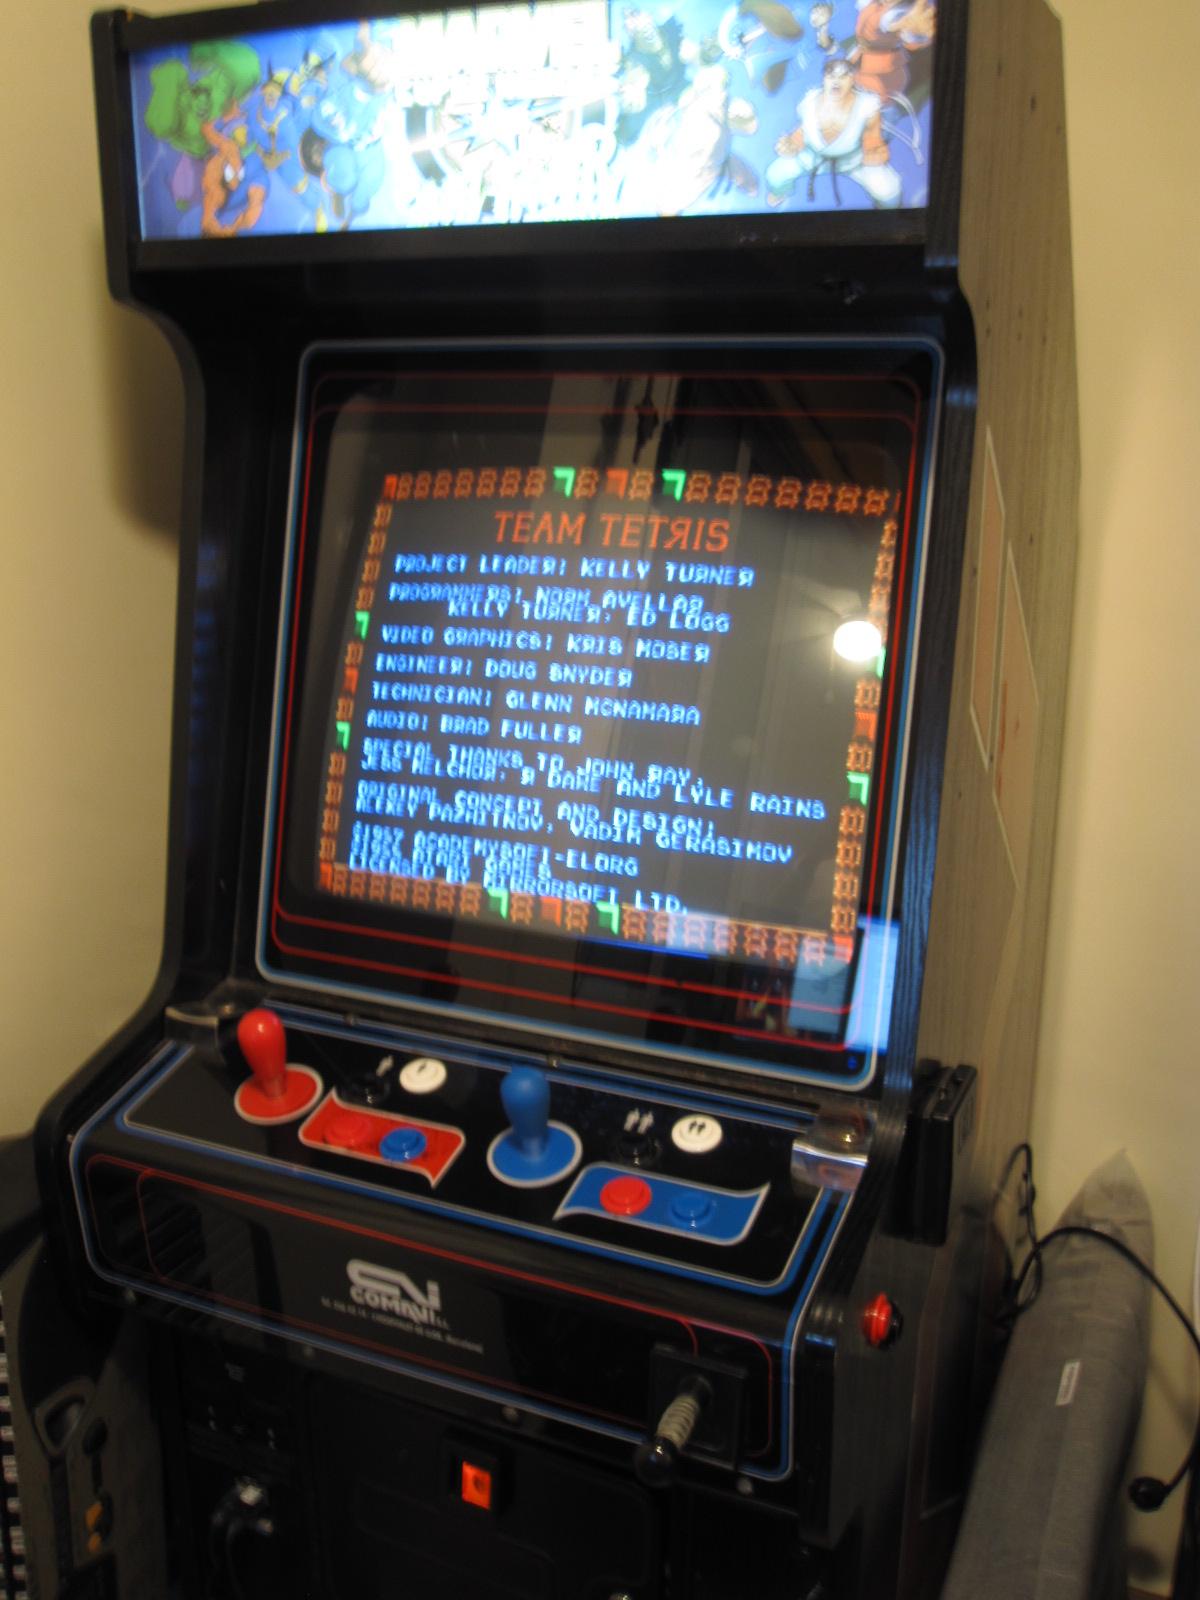 Virtual pinball mueble maquina recreativa placa jamma for Mueble maquina recreativa